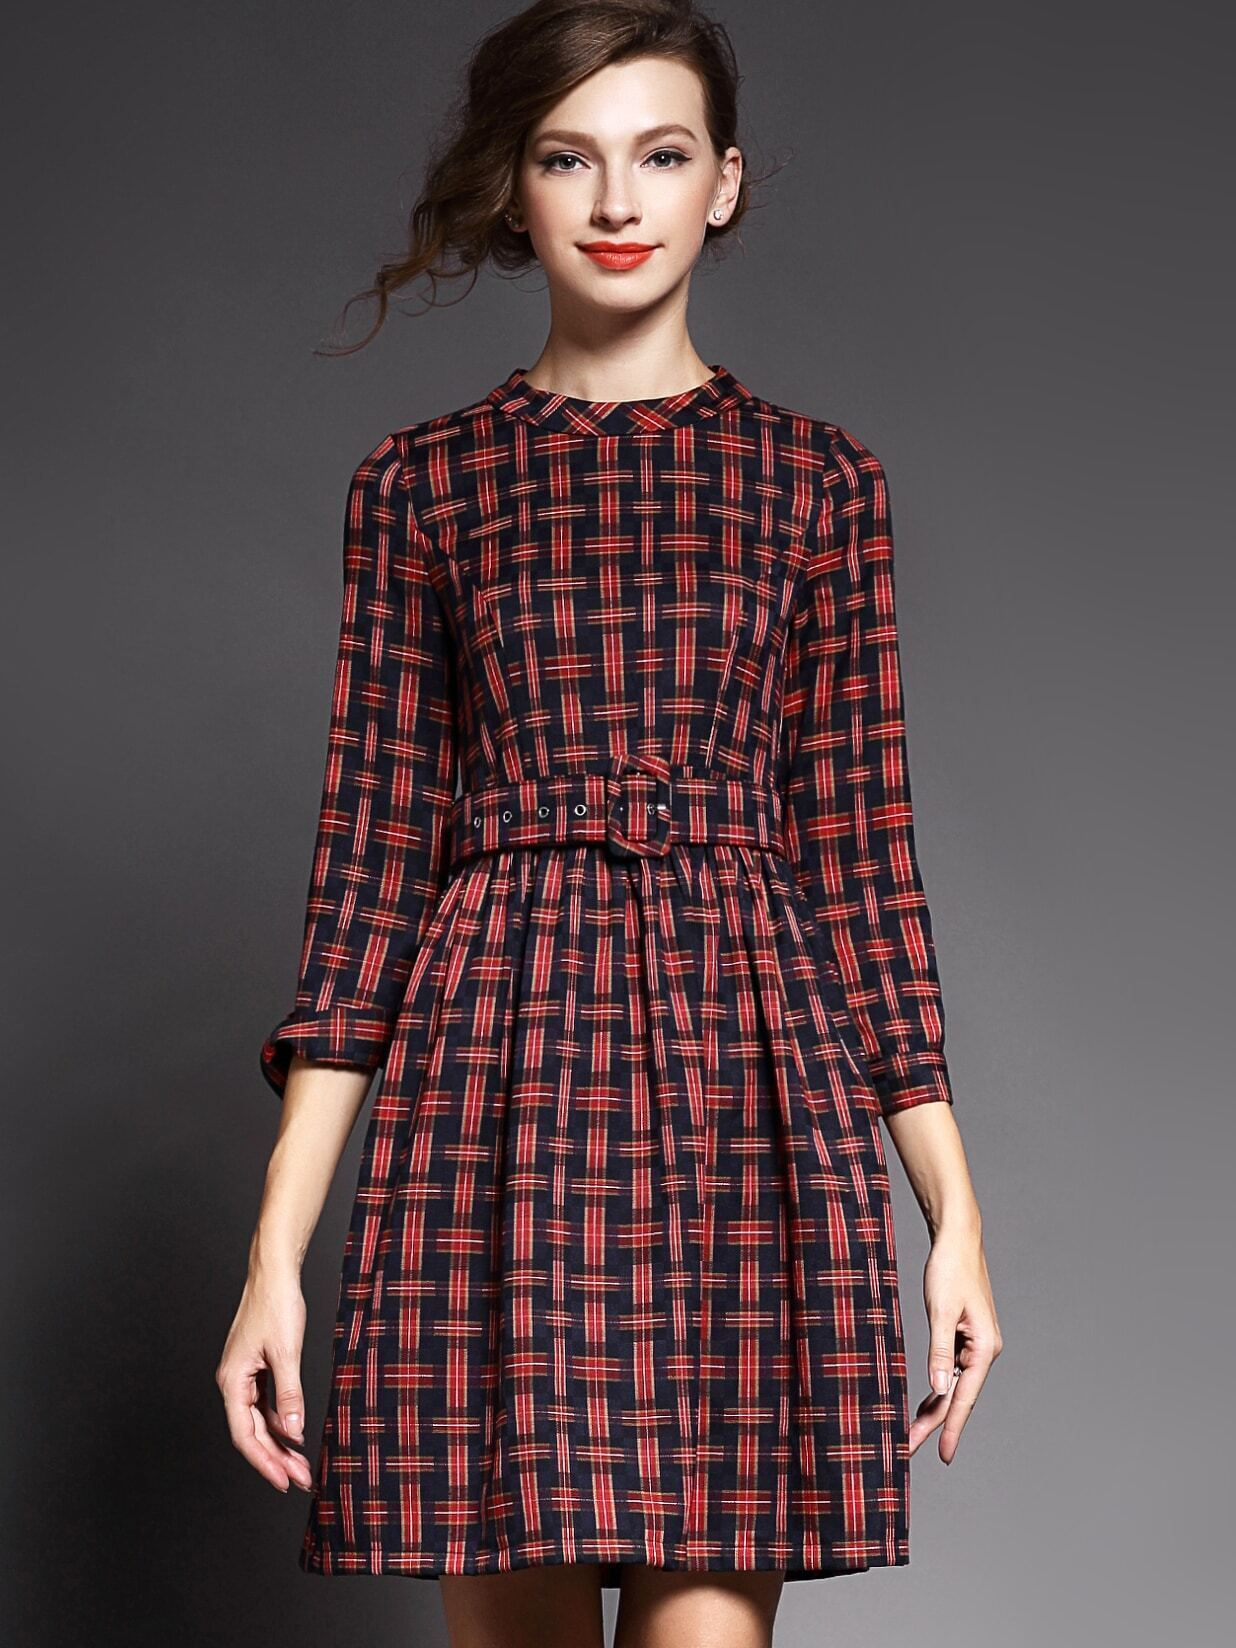 Red Round Neck Length Sleeve Drawstring Print Dress